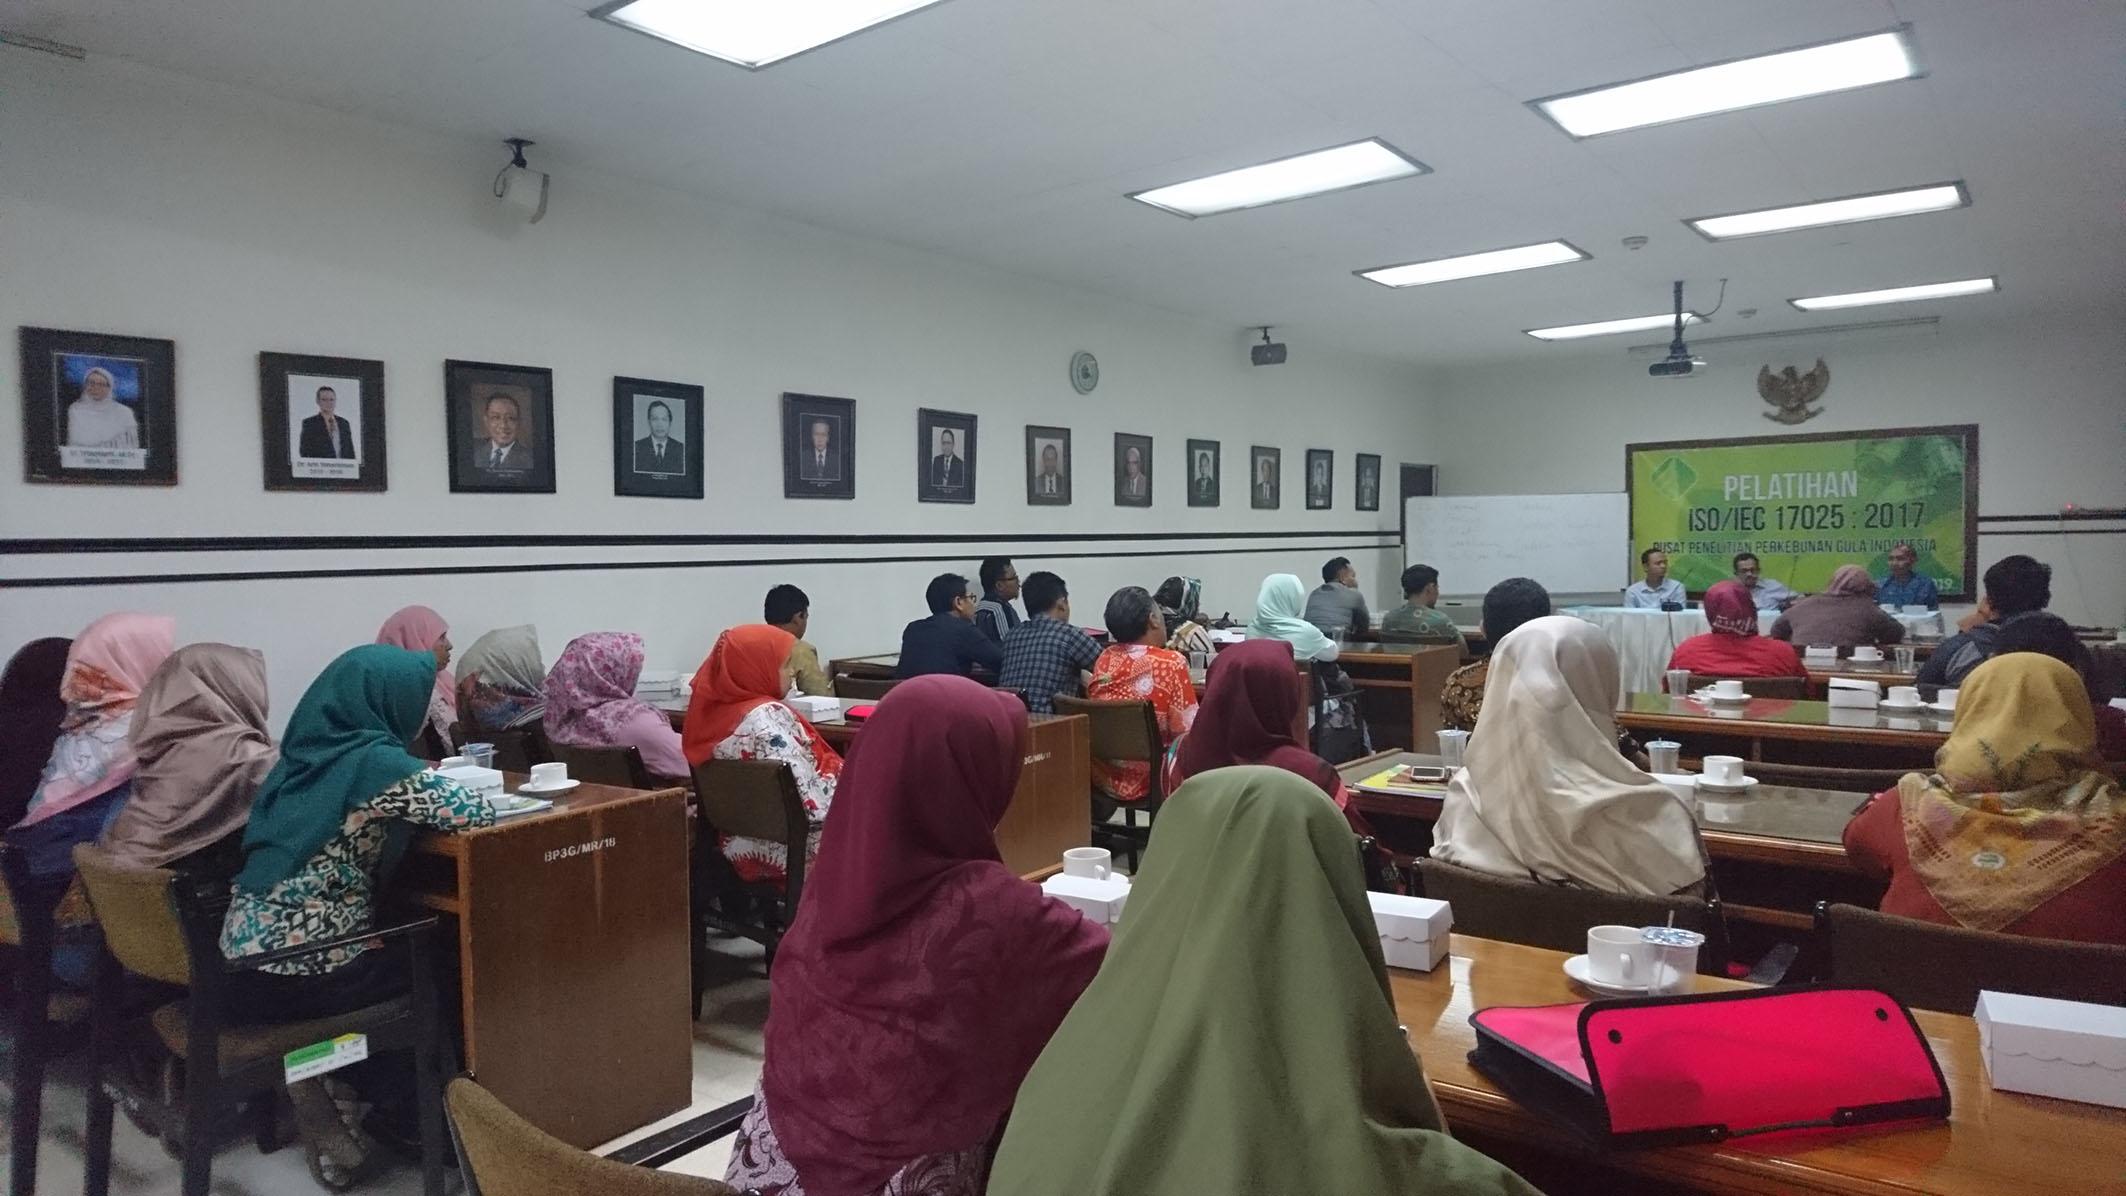 Pelatihan ISO IEC